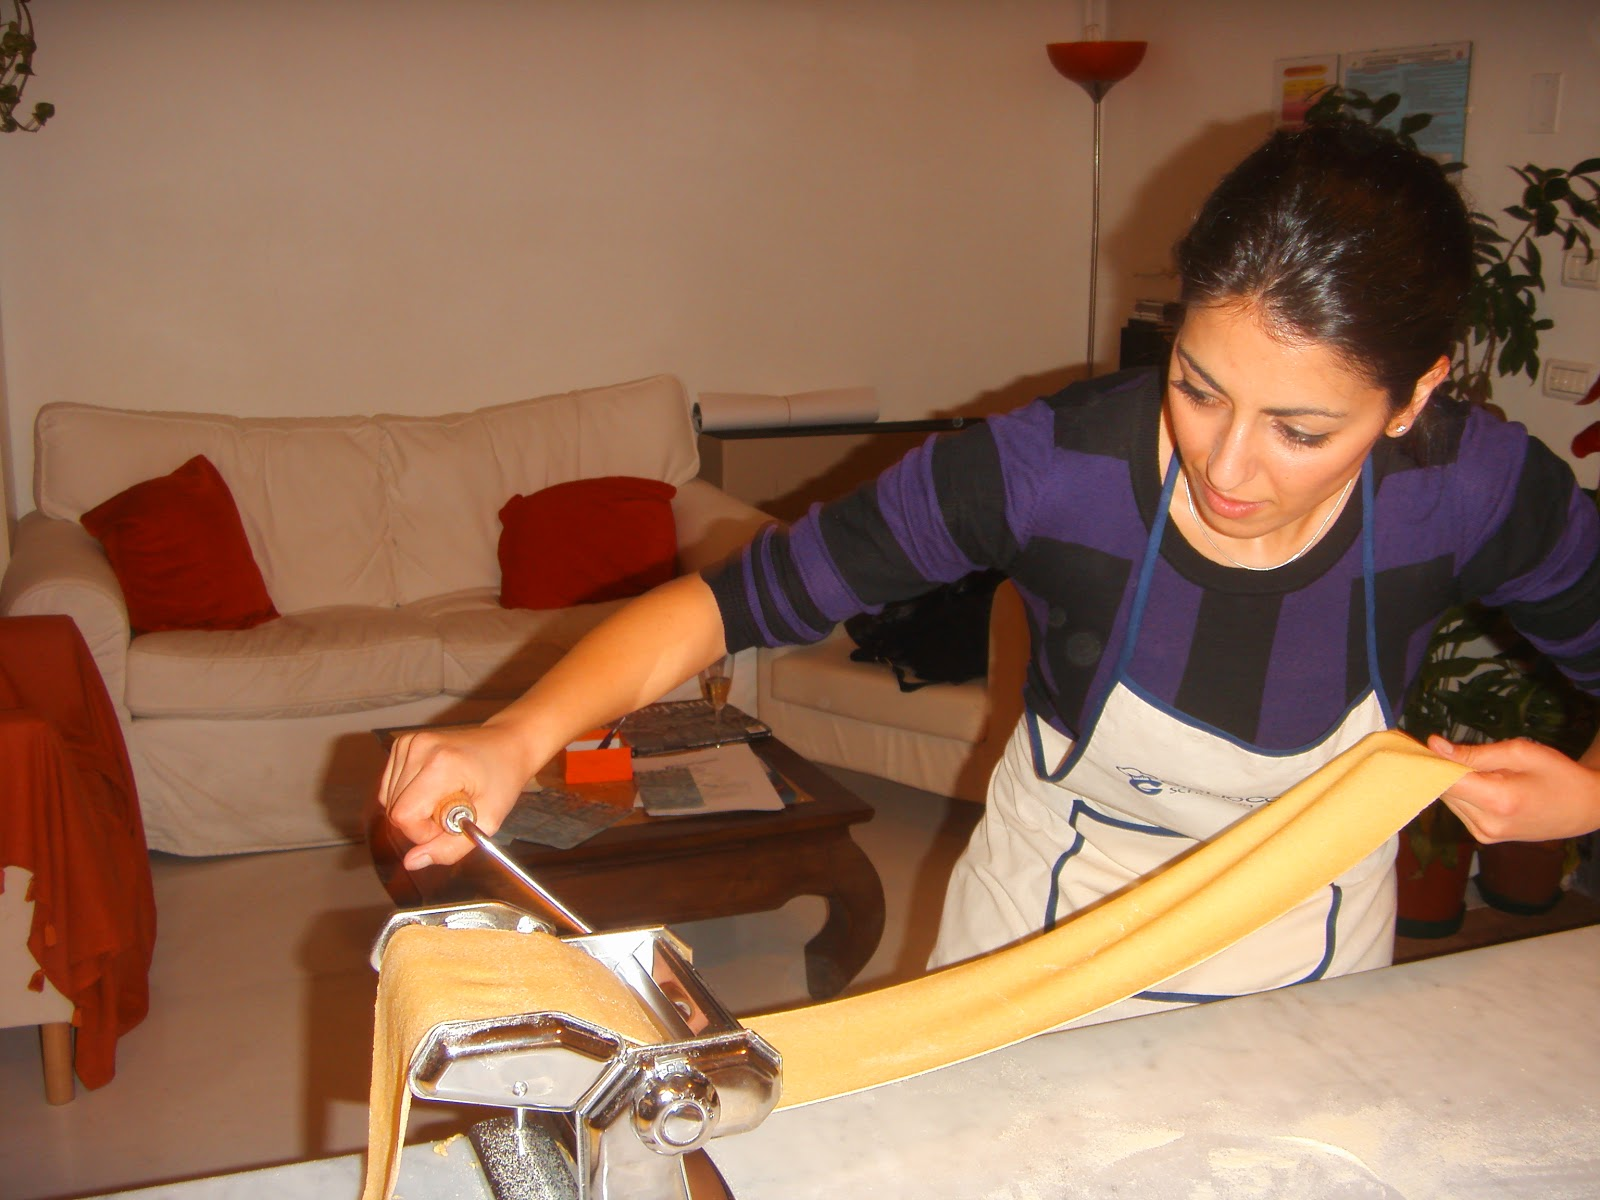 Natalie Chopped Food Network